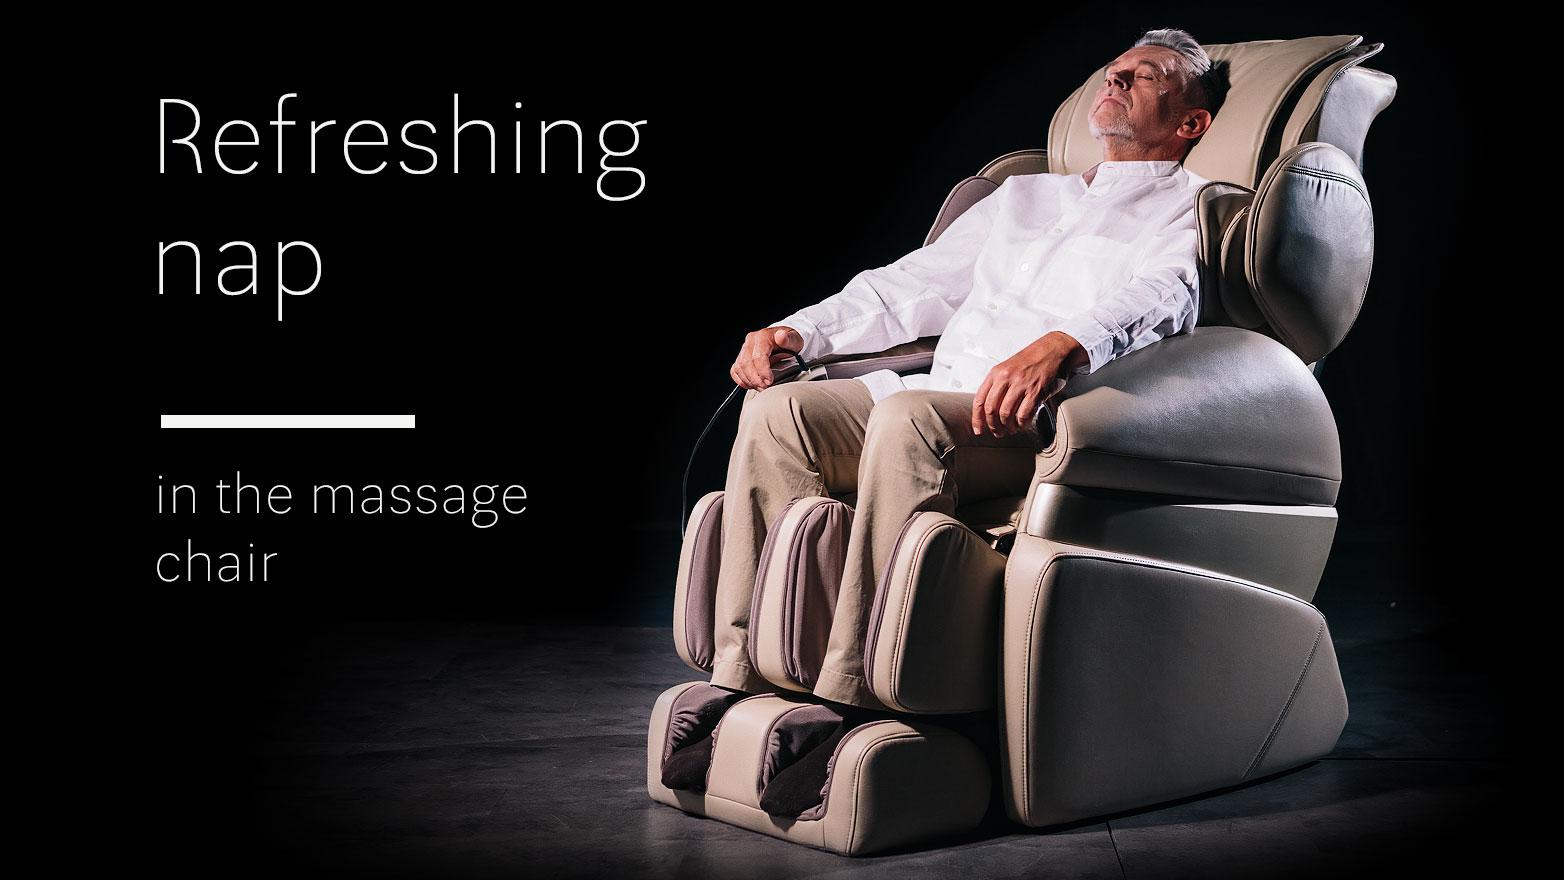 Refreshing nap in massage chair